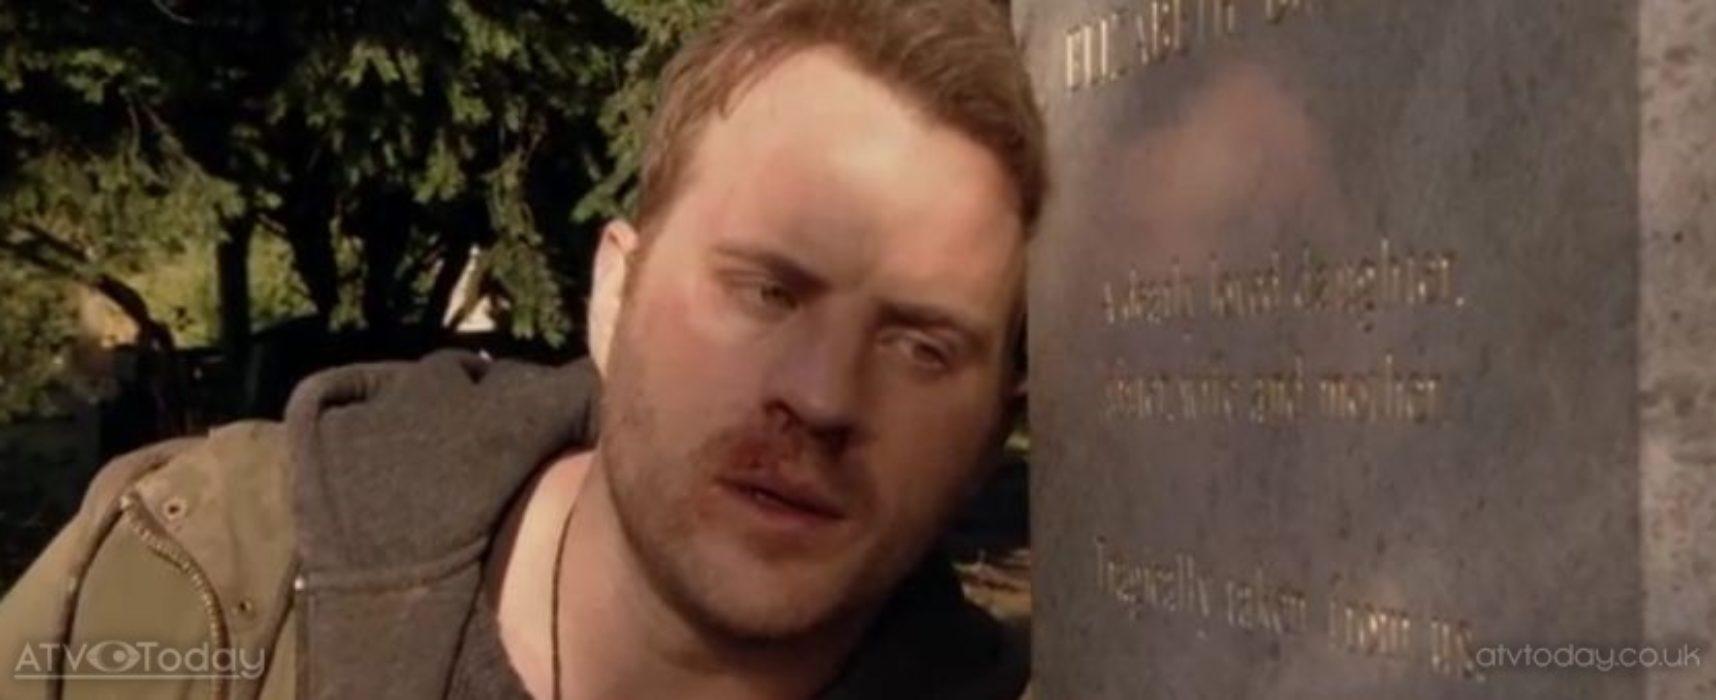 Samaritans assists EastEnders with Sean Slater storyline